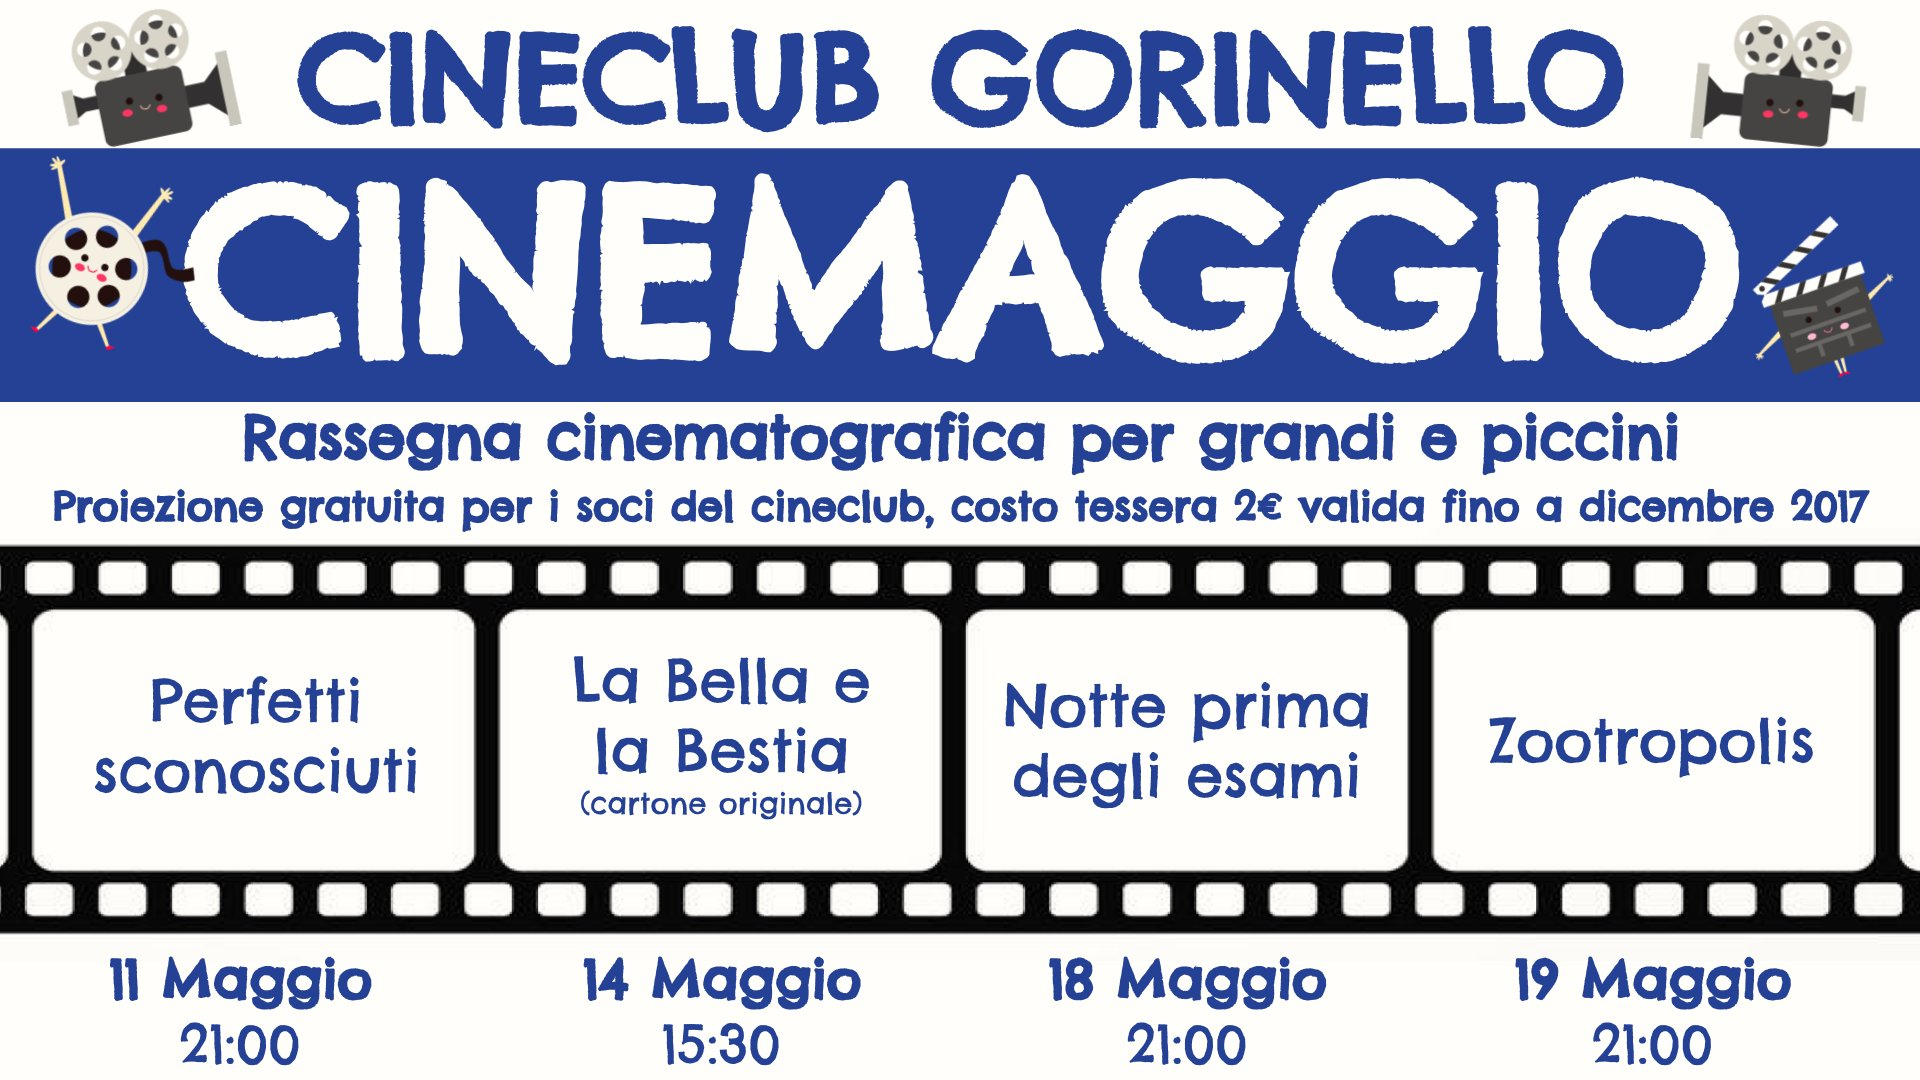 Gorinello